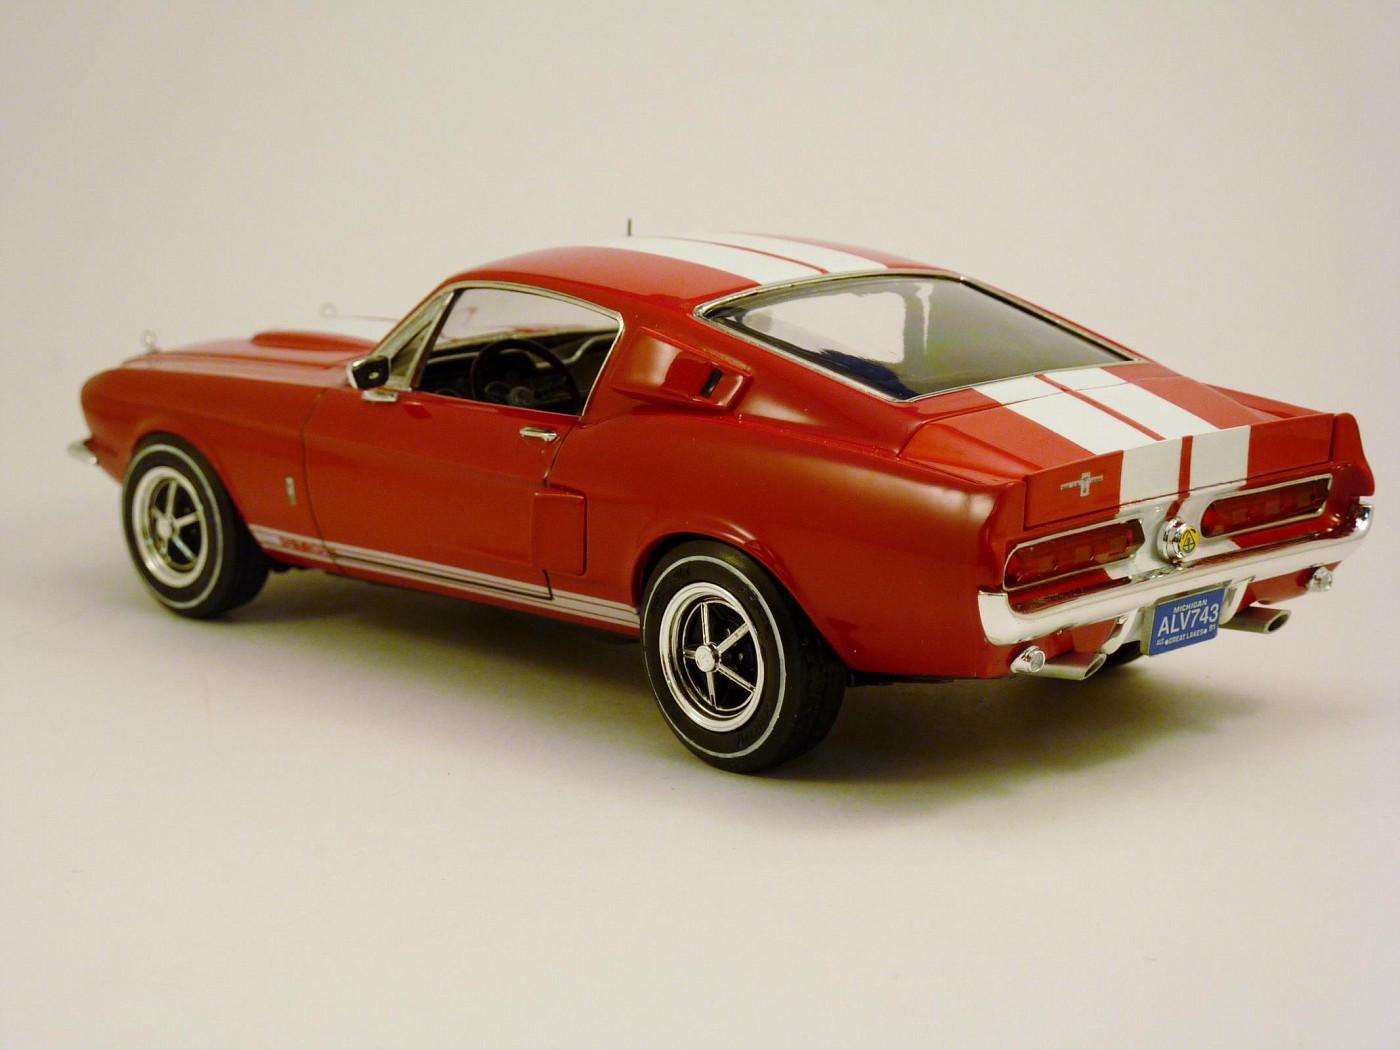 projet Mustang shelby gt 500 1969 terminée Photo2-vi